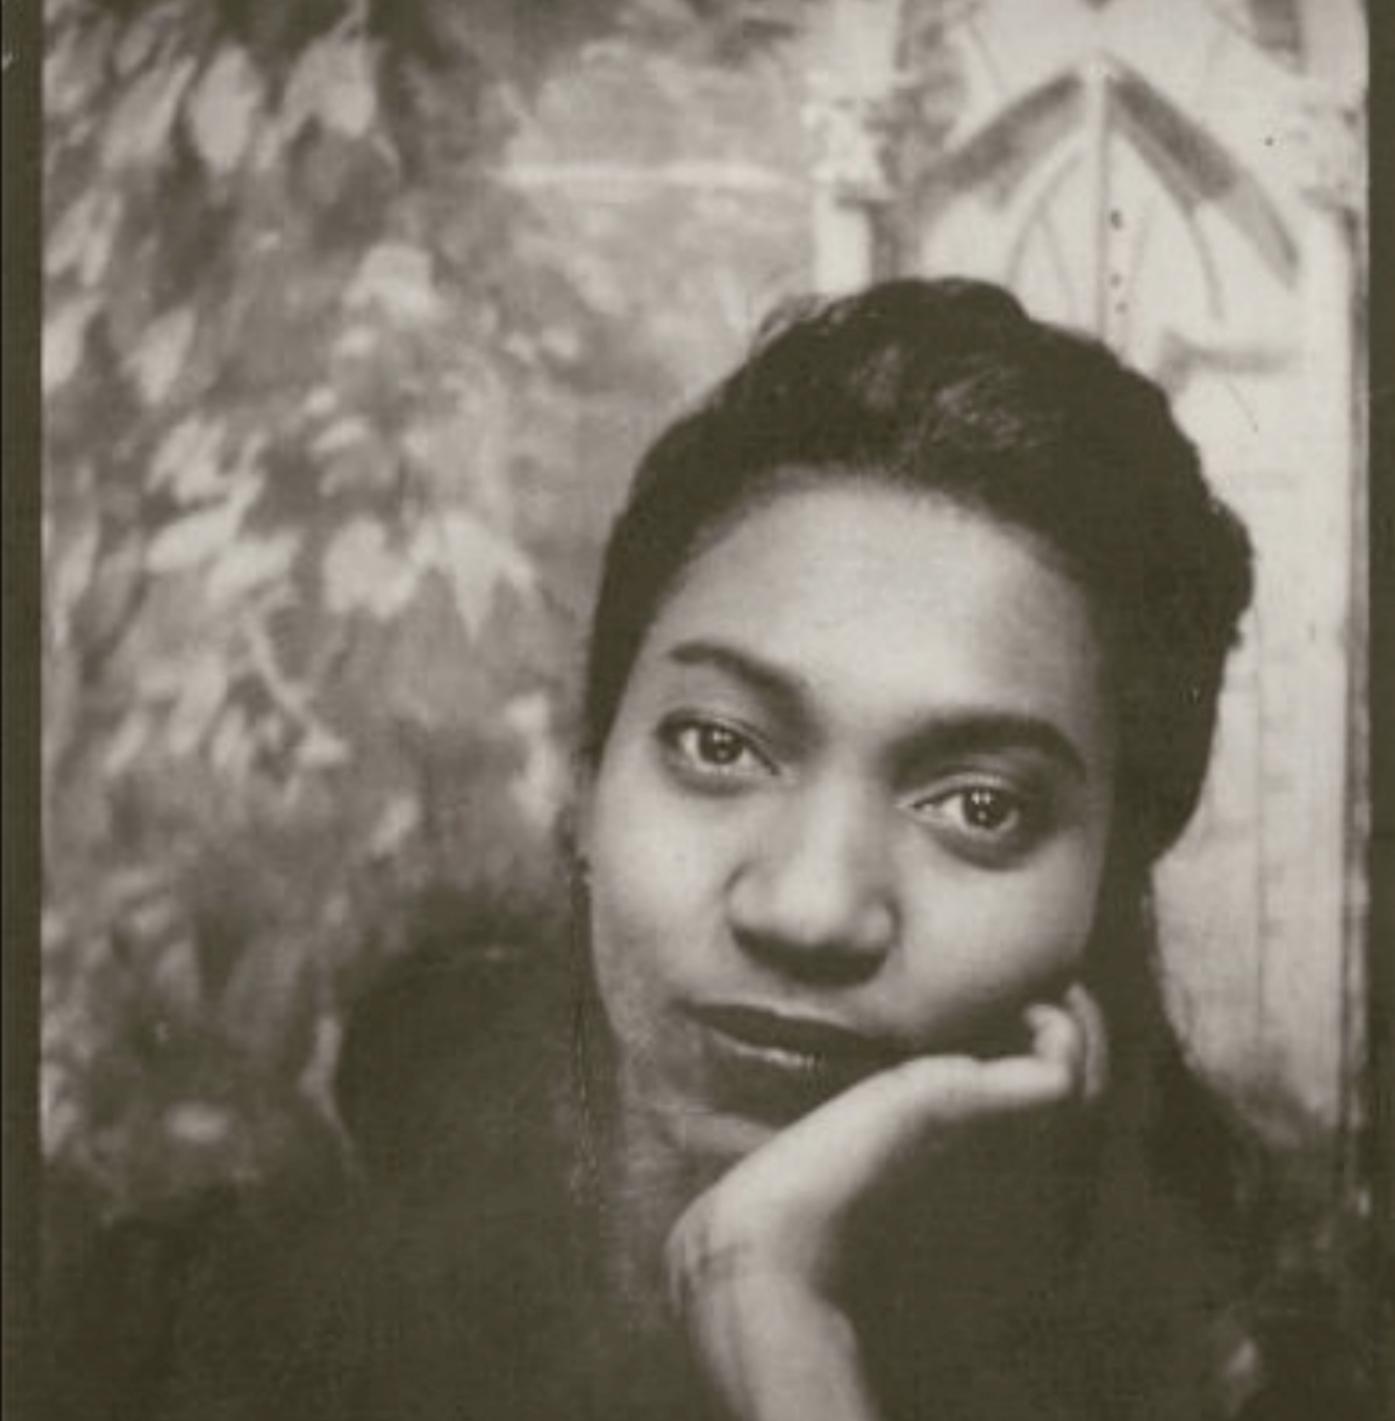 My Grandmother, Artist & Model Mary Williams circa 1940